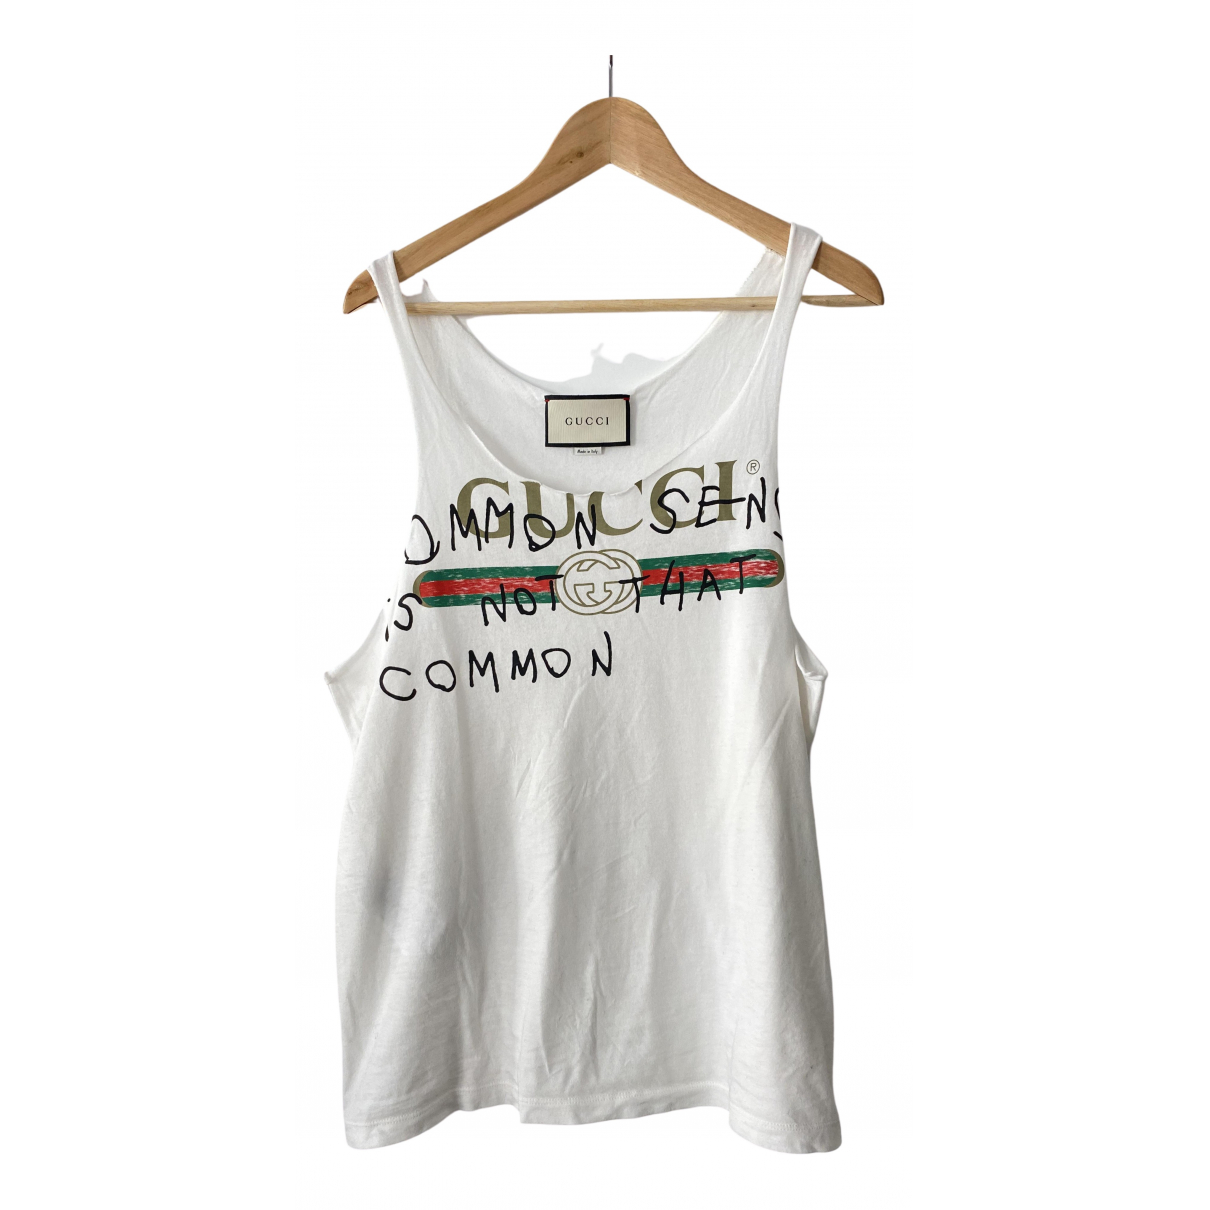 Camiseta sin mangas Gucci